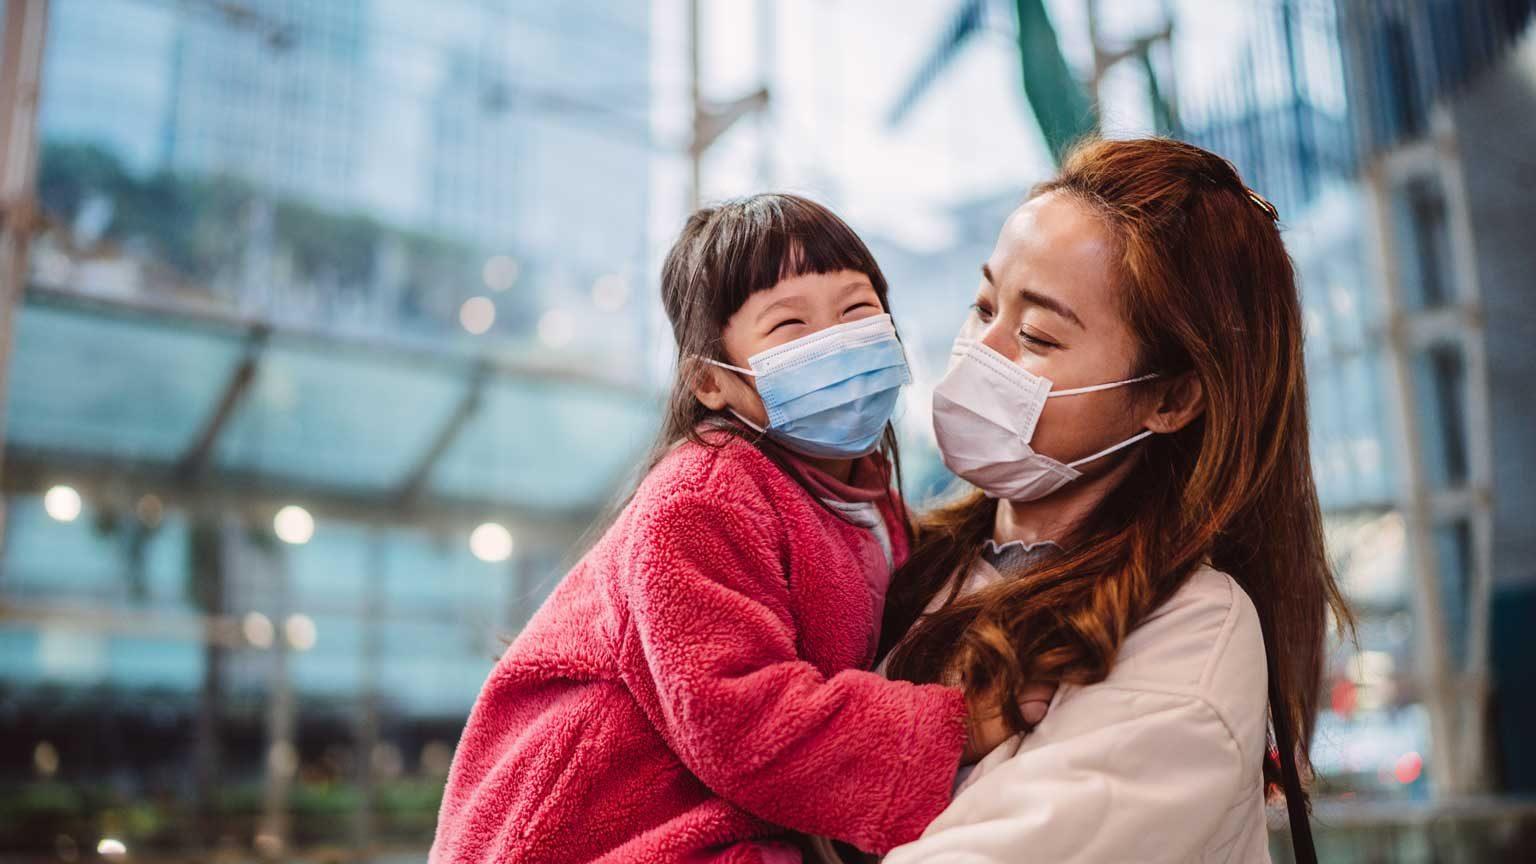 Mom & daughter in medical face masks talking joyfully in train station